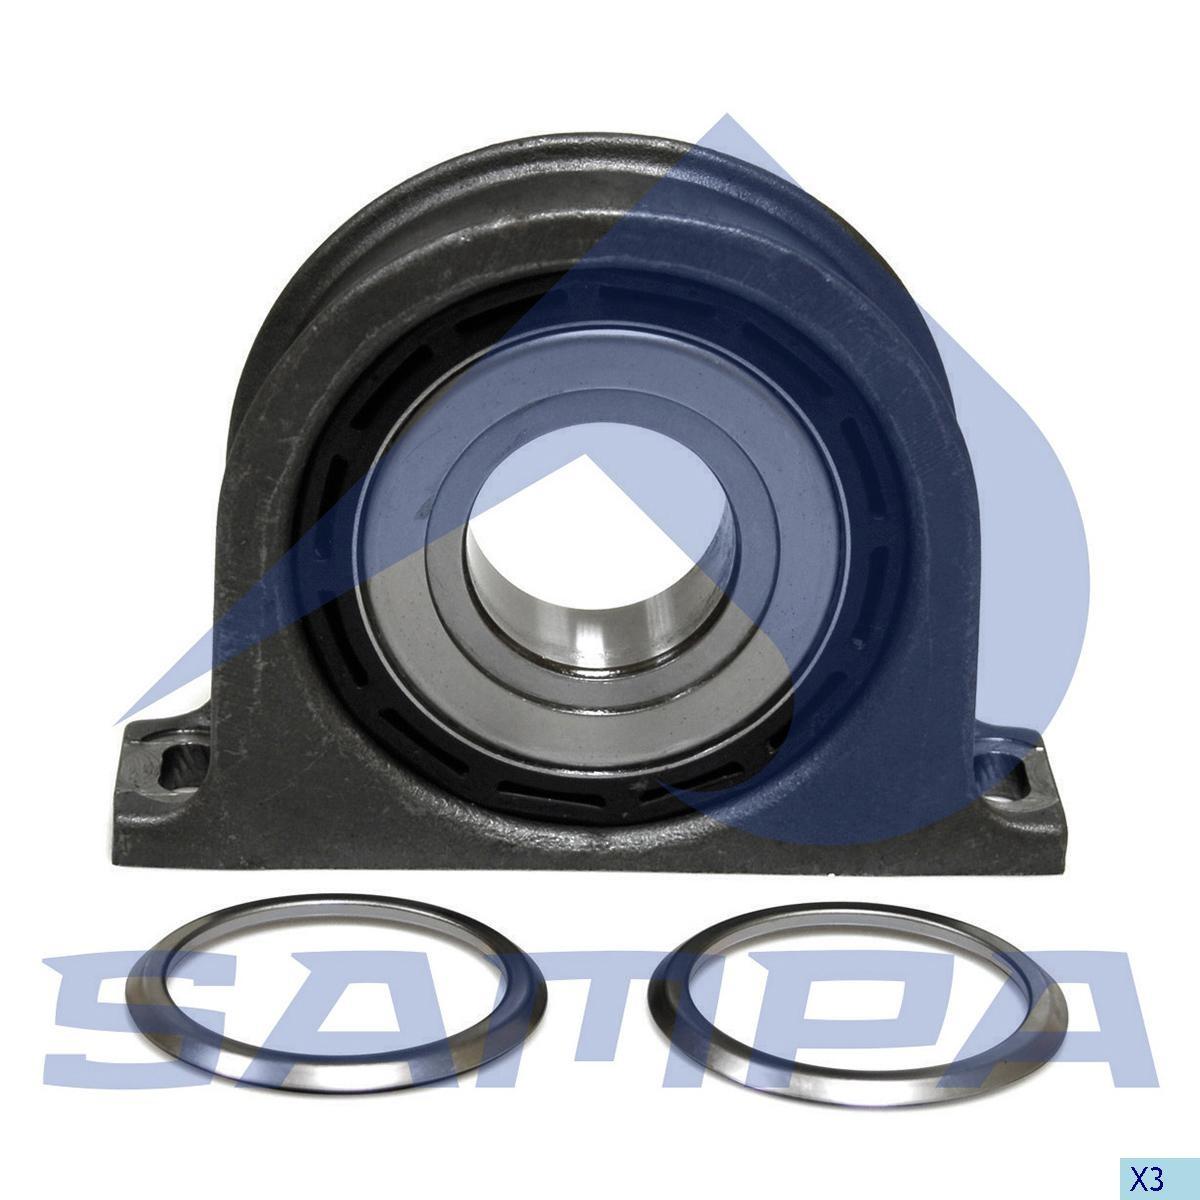 Подвесной подшипник DAF 70mm photo